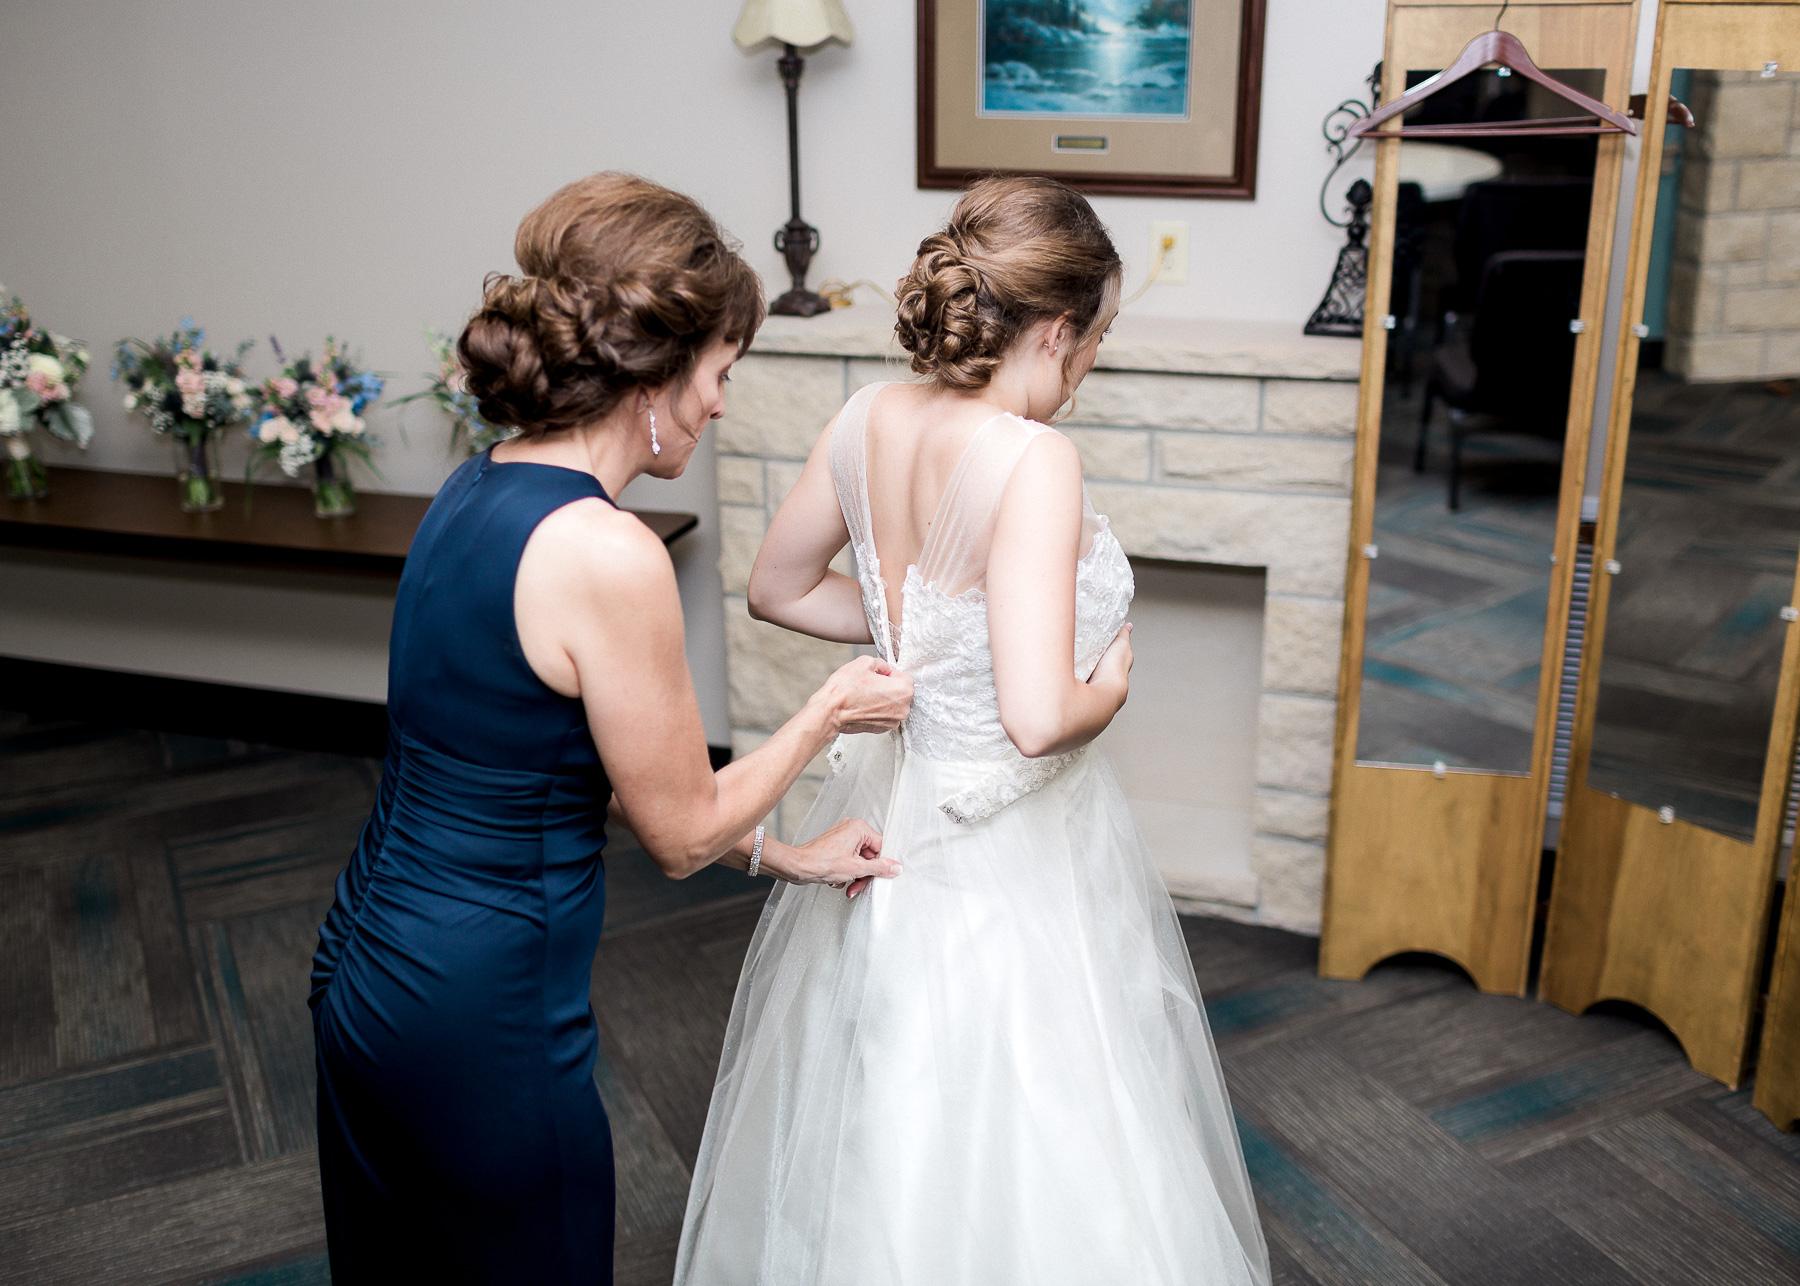 mother of bride zipping on wedding dress